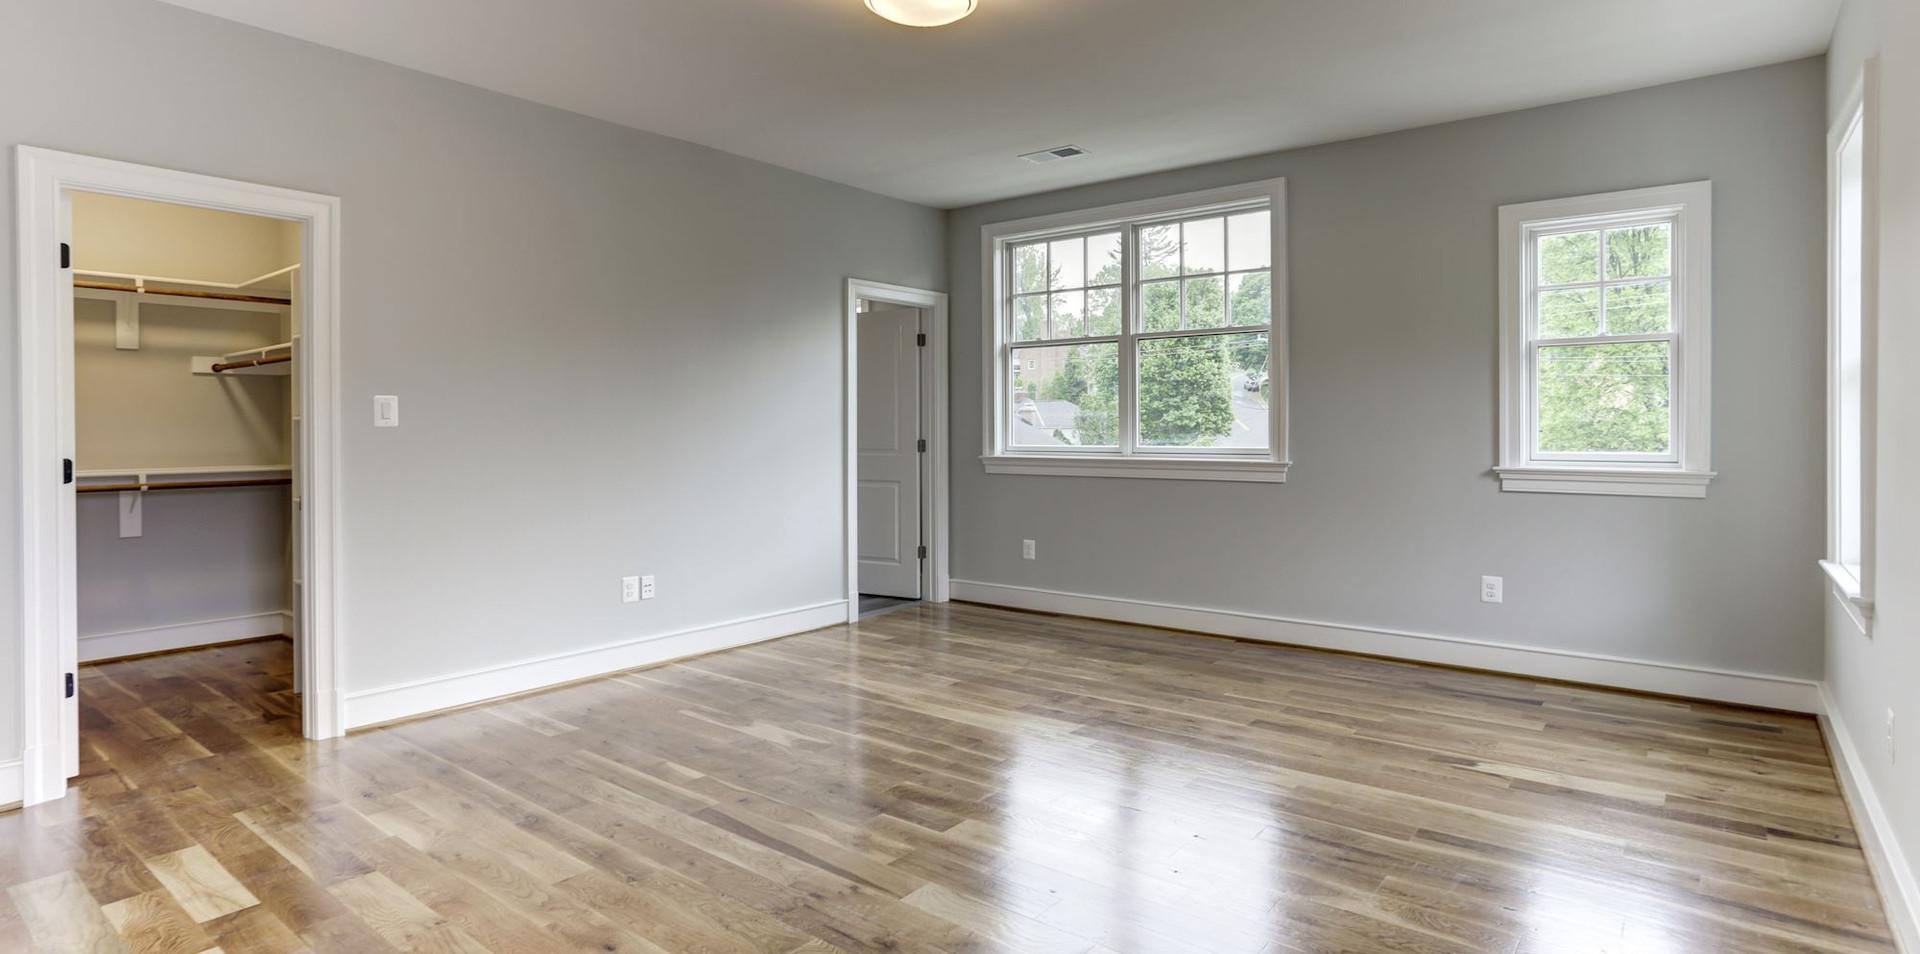 1 of 3 additonal bedrooms upstairs